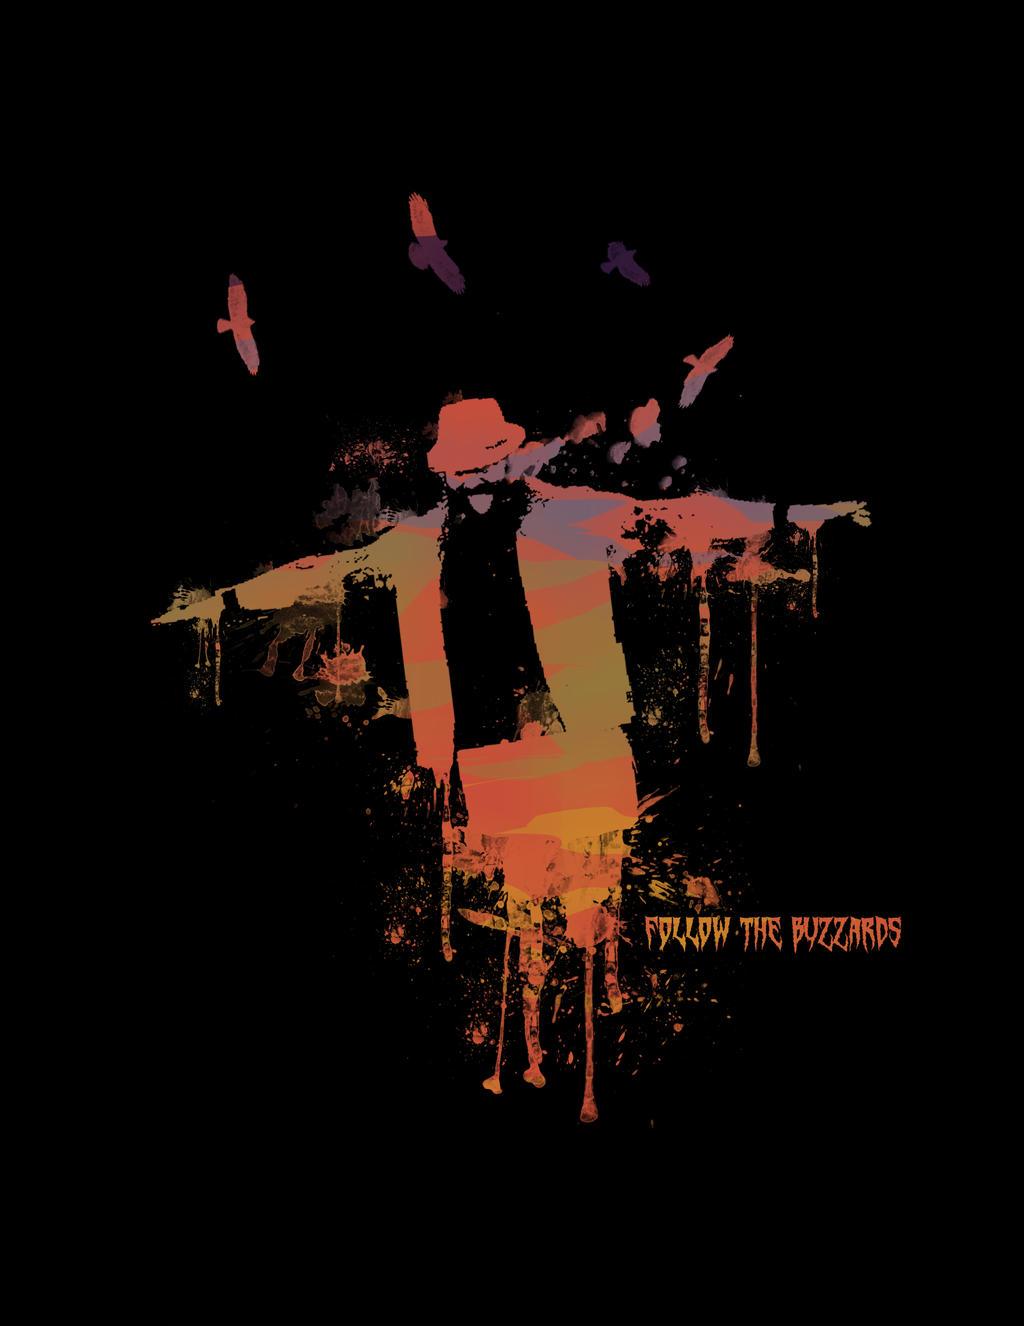 Bray Wyatt - Follow the buzzards by windserpent